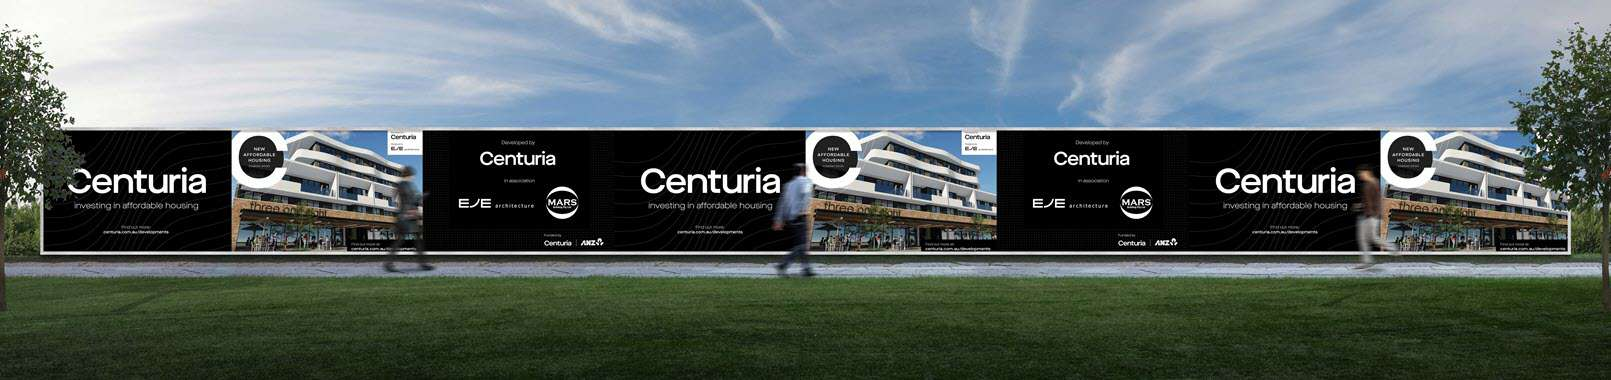 branded hoarding at Centuria development sites